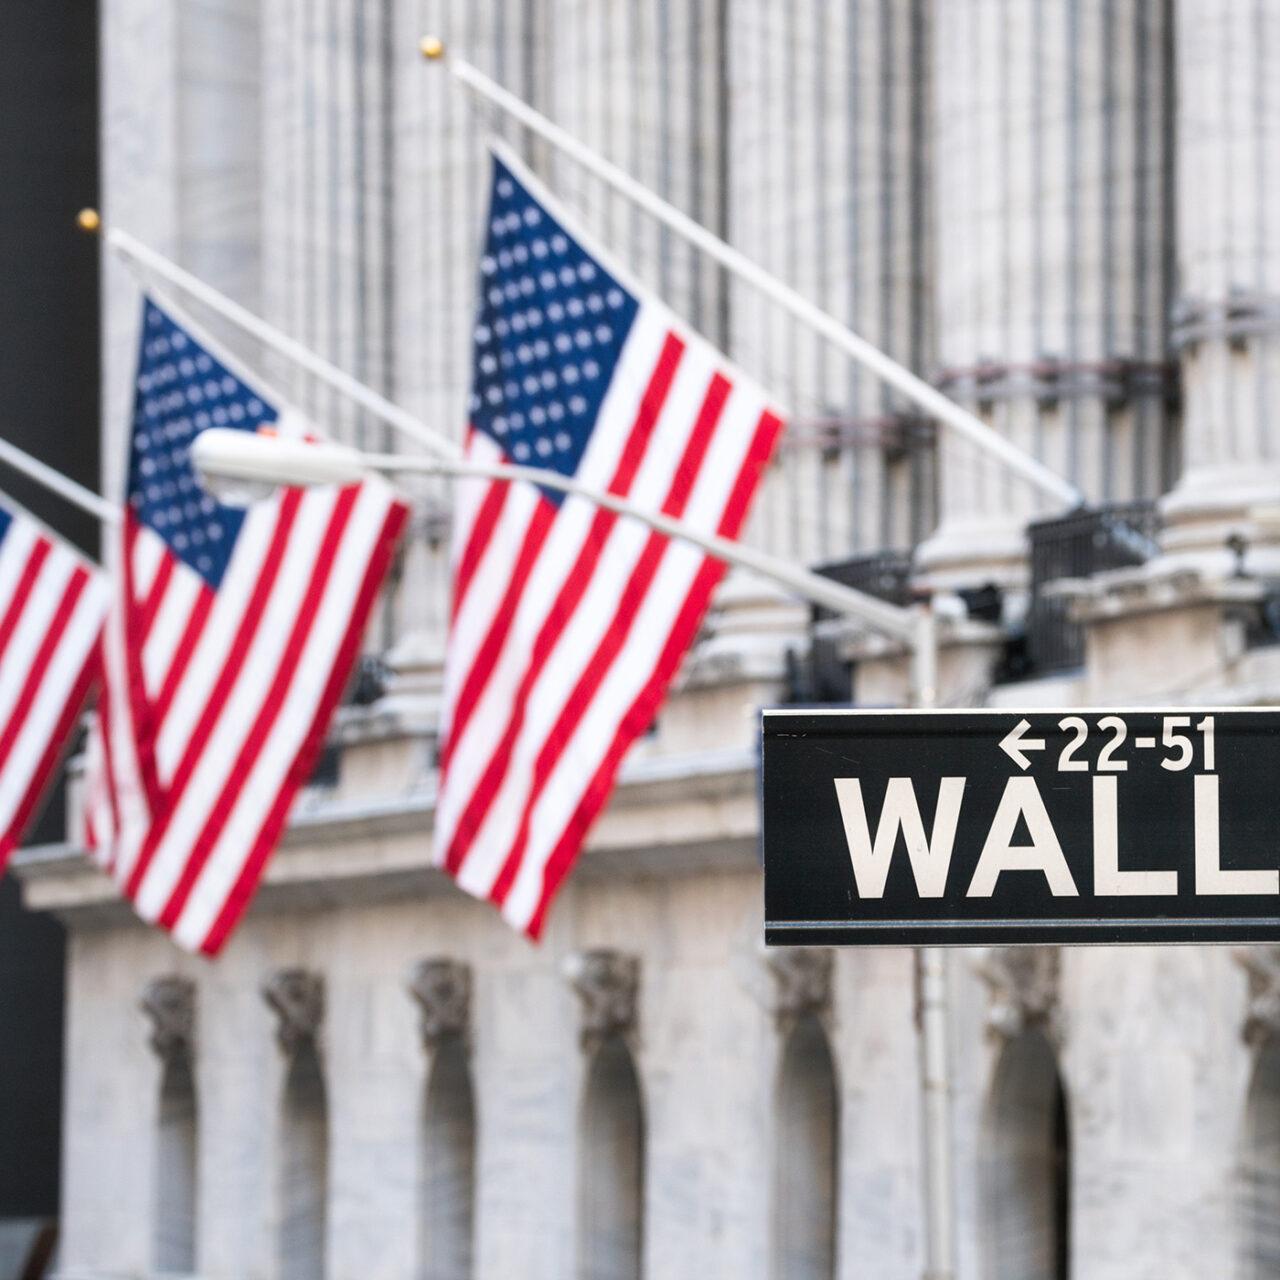 US Large Cap-Märkte weiter interessant